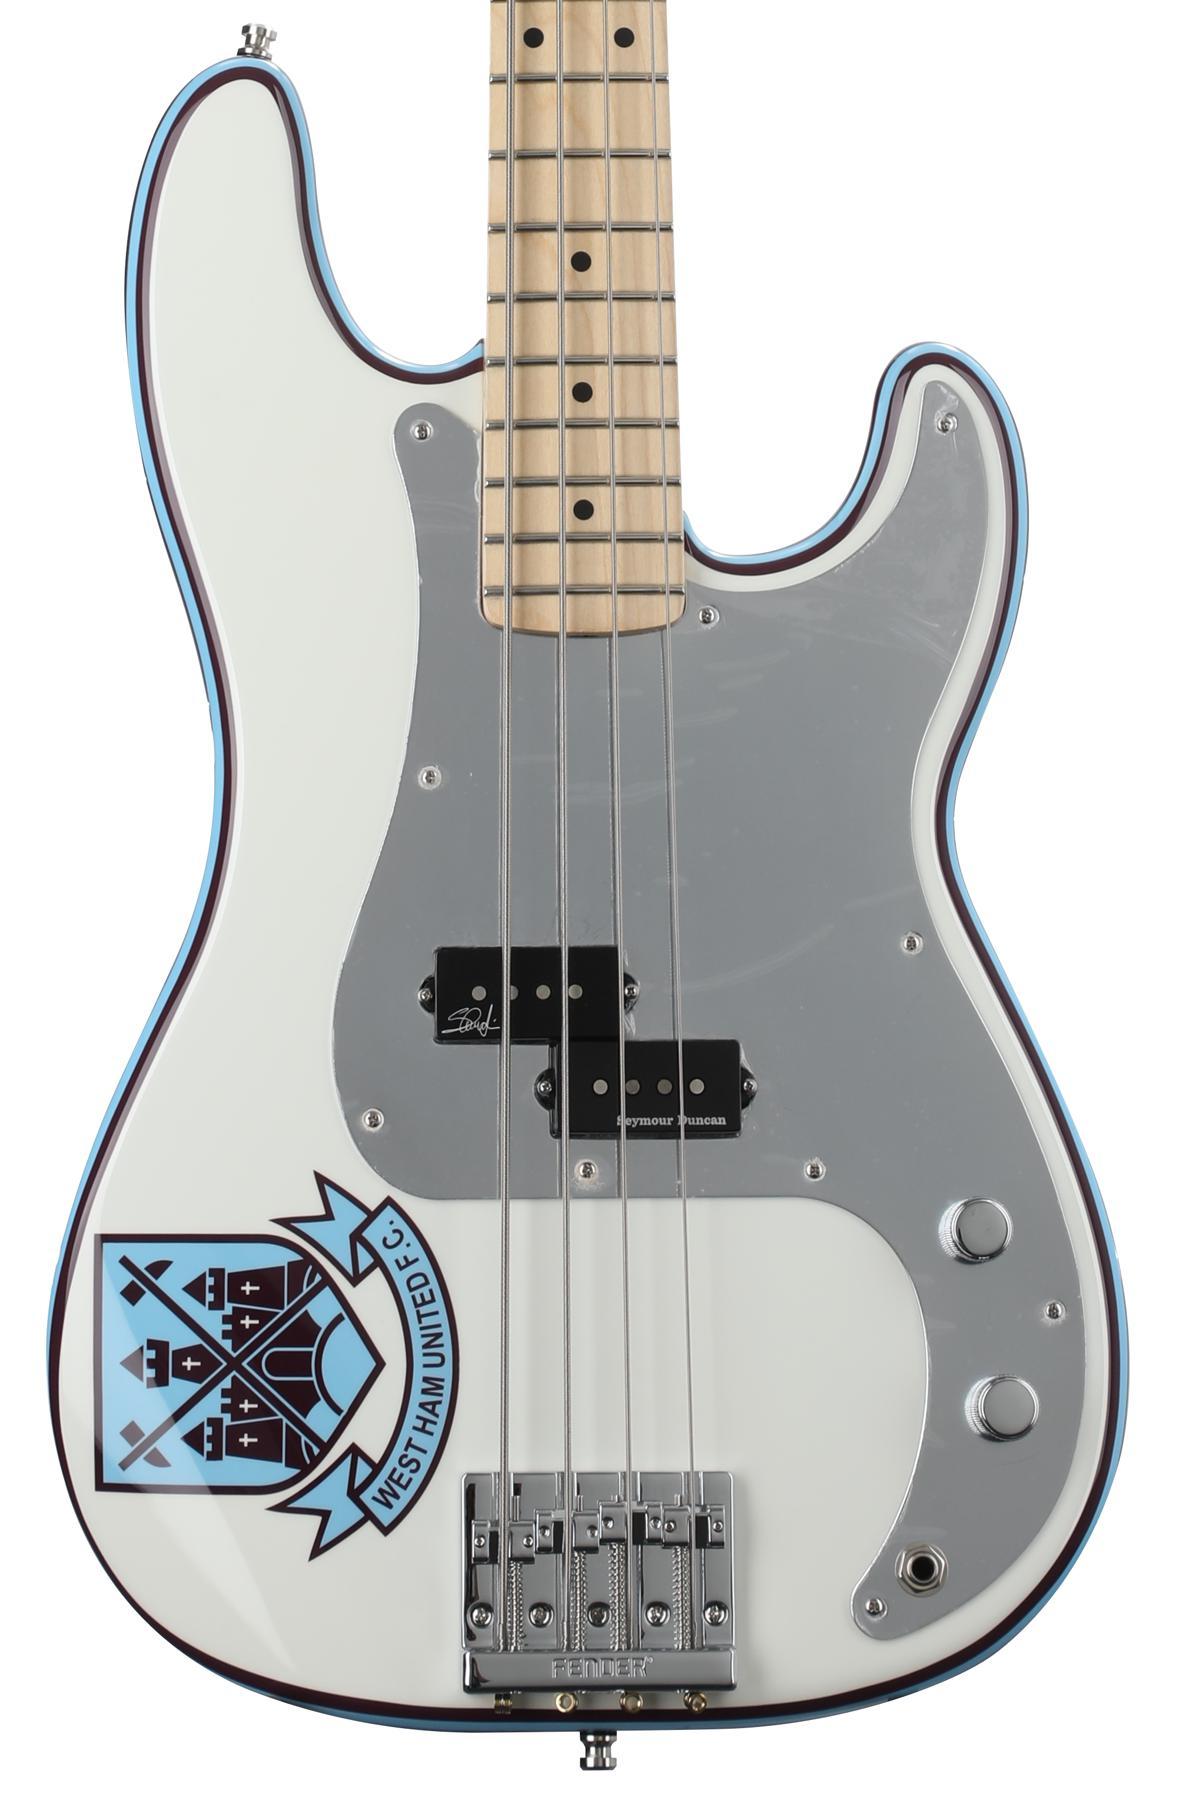 5. Fender Steve Harris Precision Bass